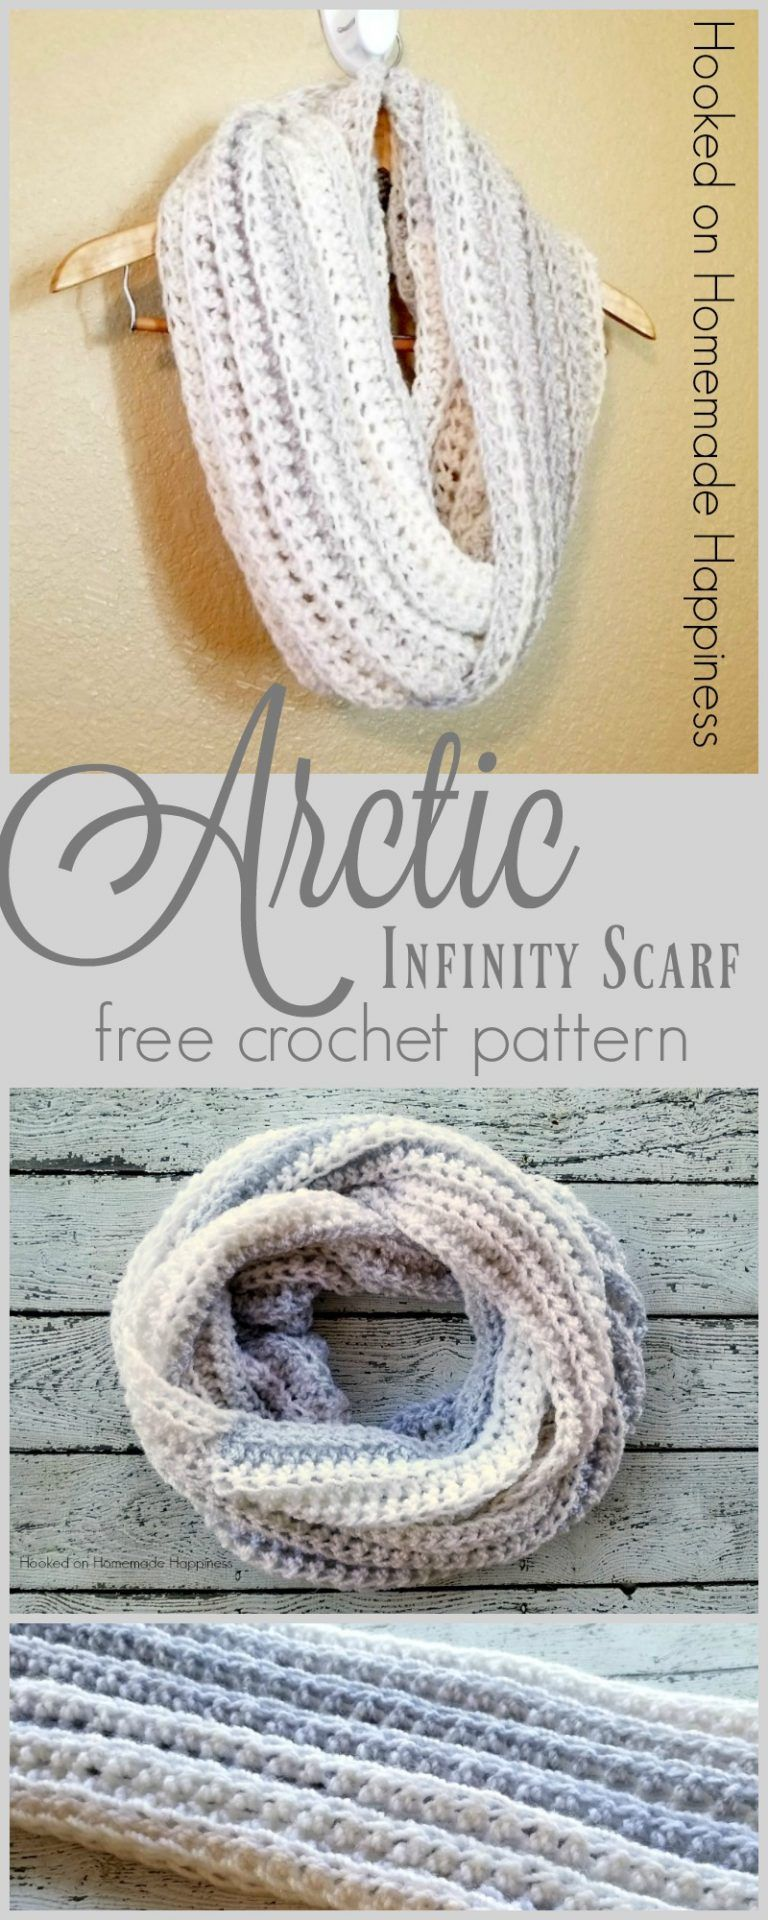 Arctic Infinity Scarf Crochet Pattern | crochet patterns | Pinterest ...